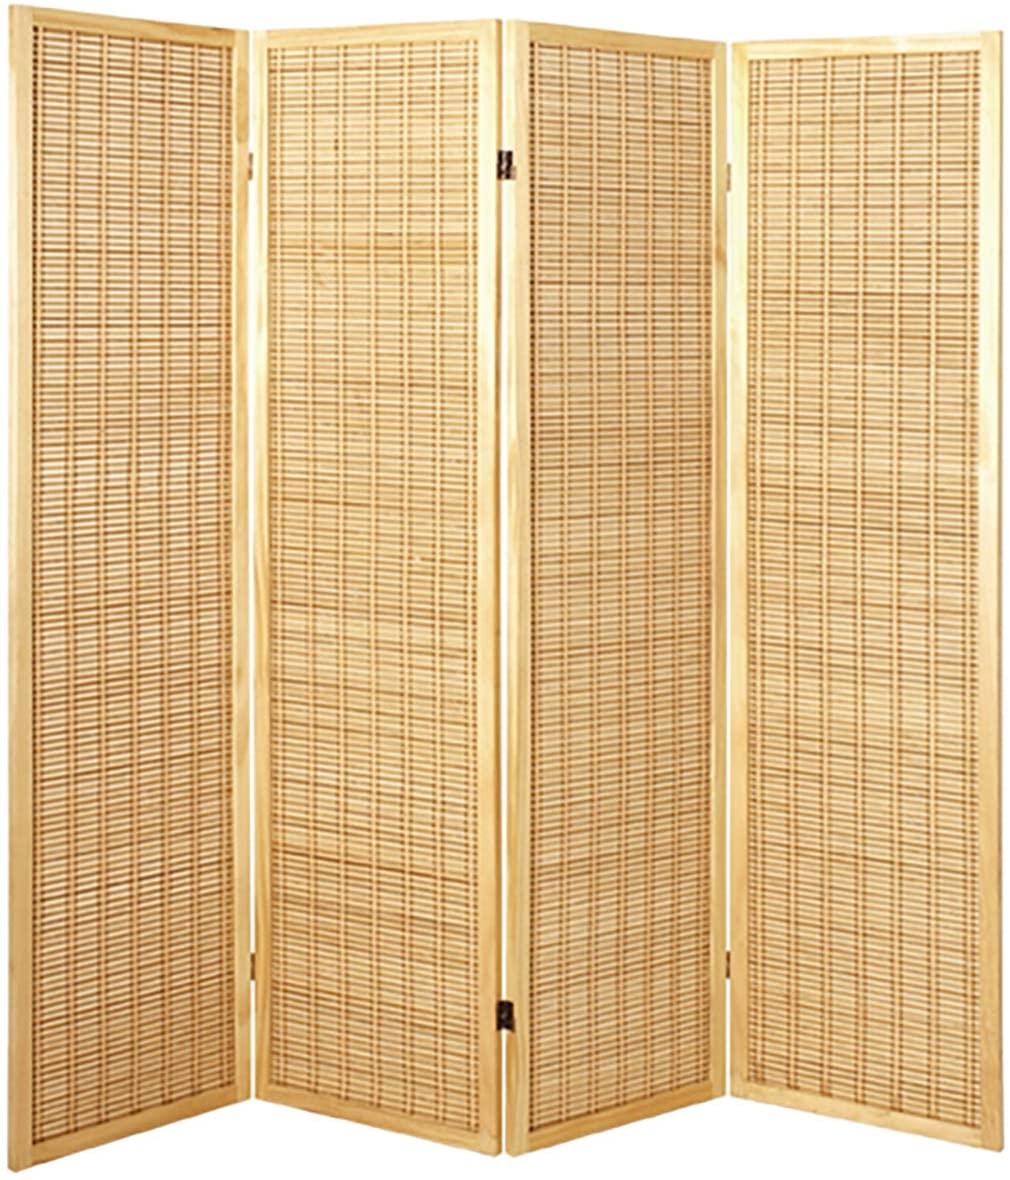 Full Size of Paravent Bambus Haku Mbel Massivholz Naturfarben Mit Bambusmatte Hhe Garten Bett Wohnzimmer Paravent Bambus